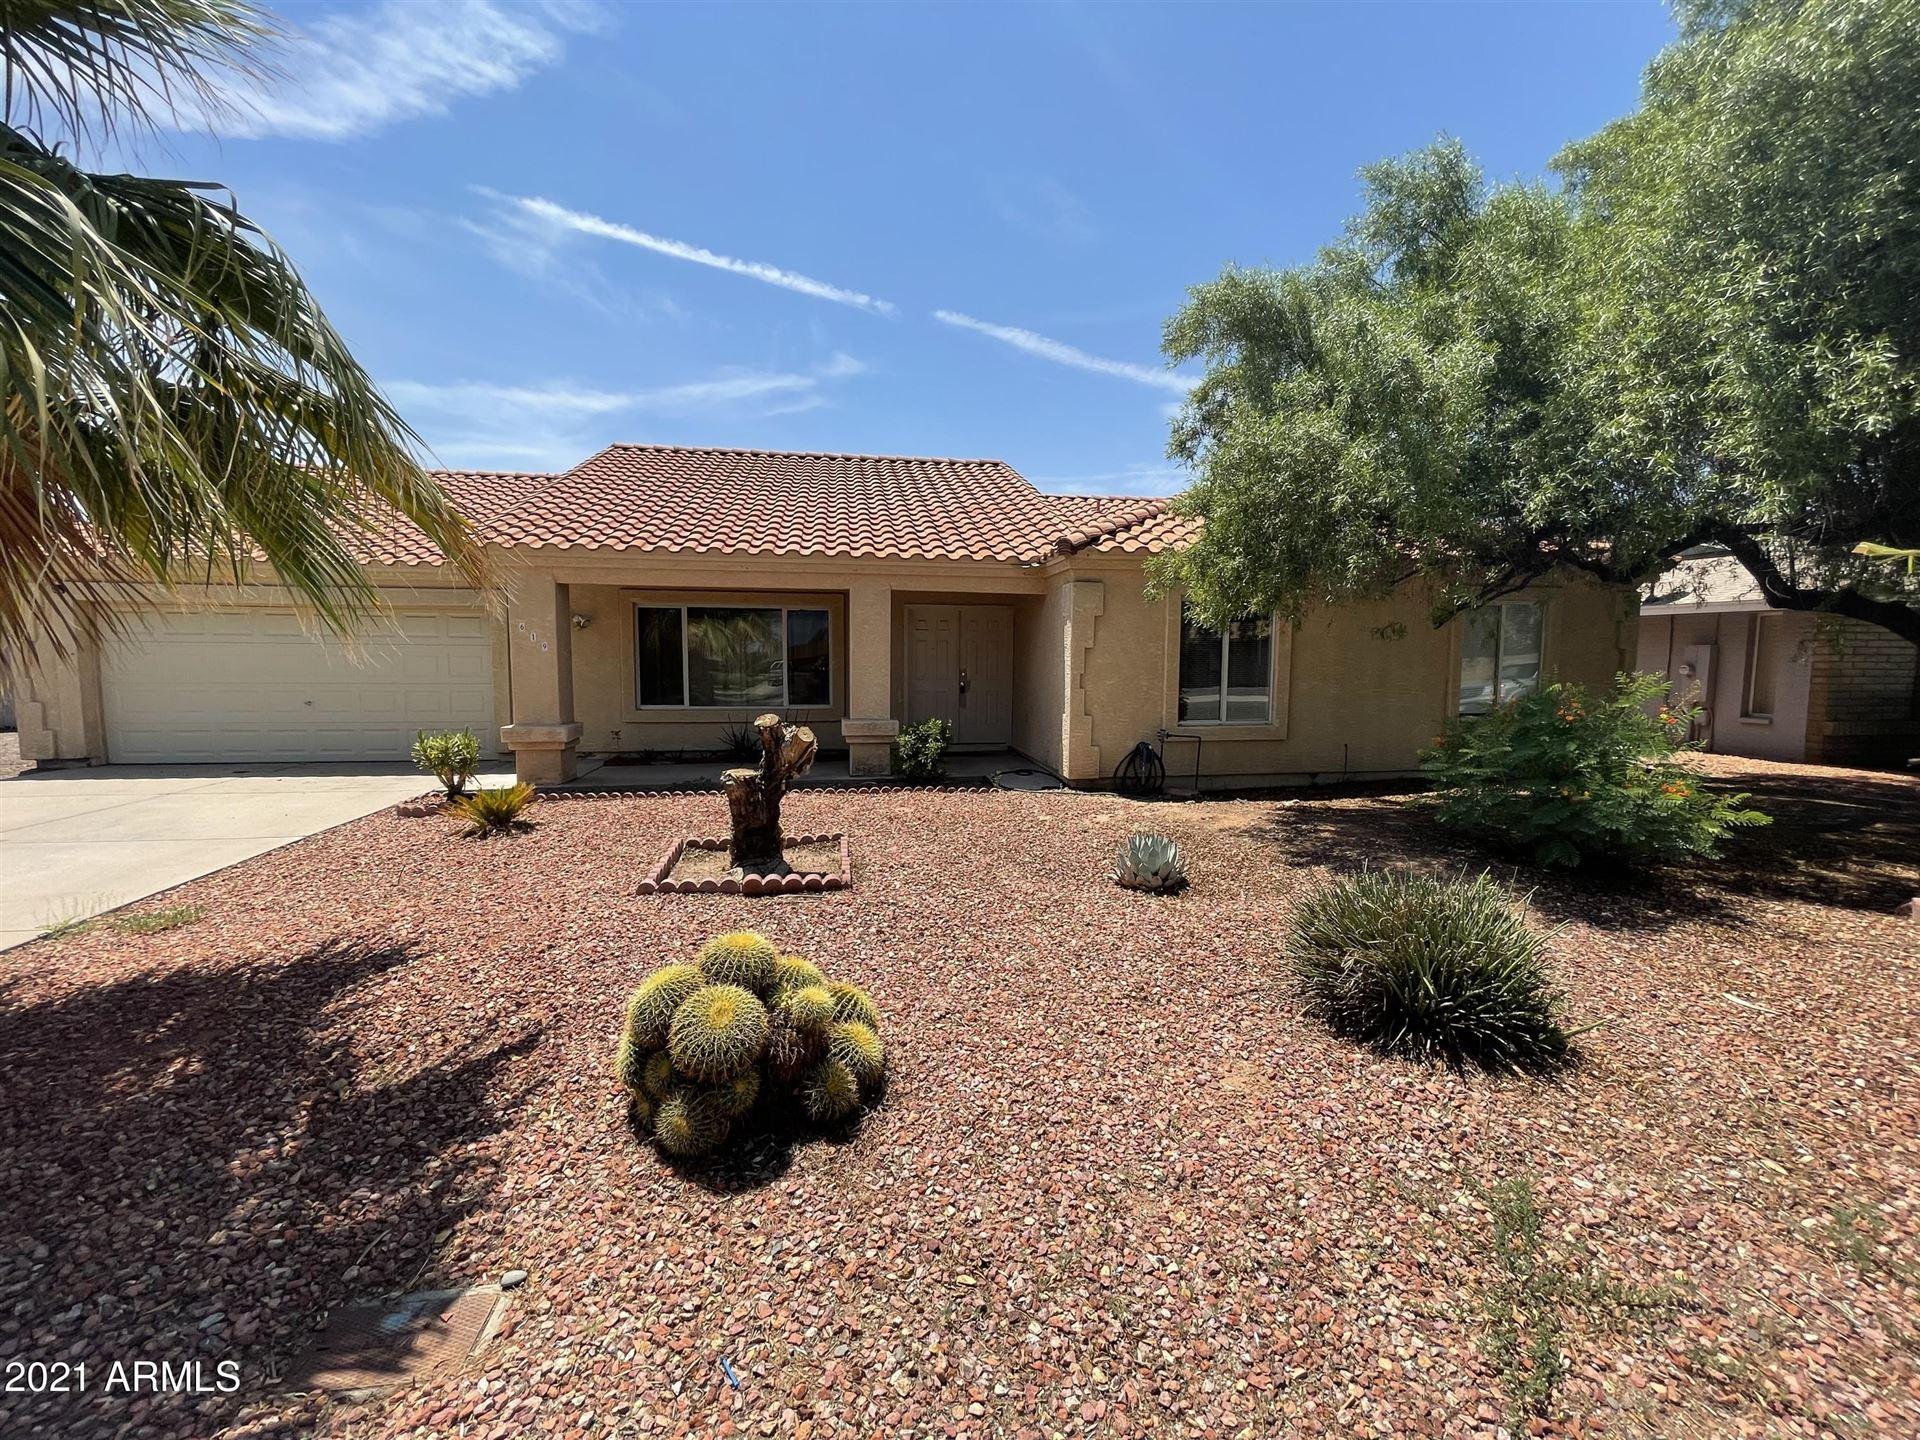 619 E HELENA Drive, Phoenix, AZ 85022 - MLS#: 6276269